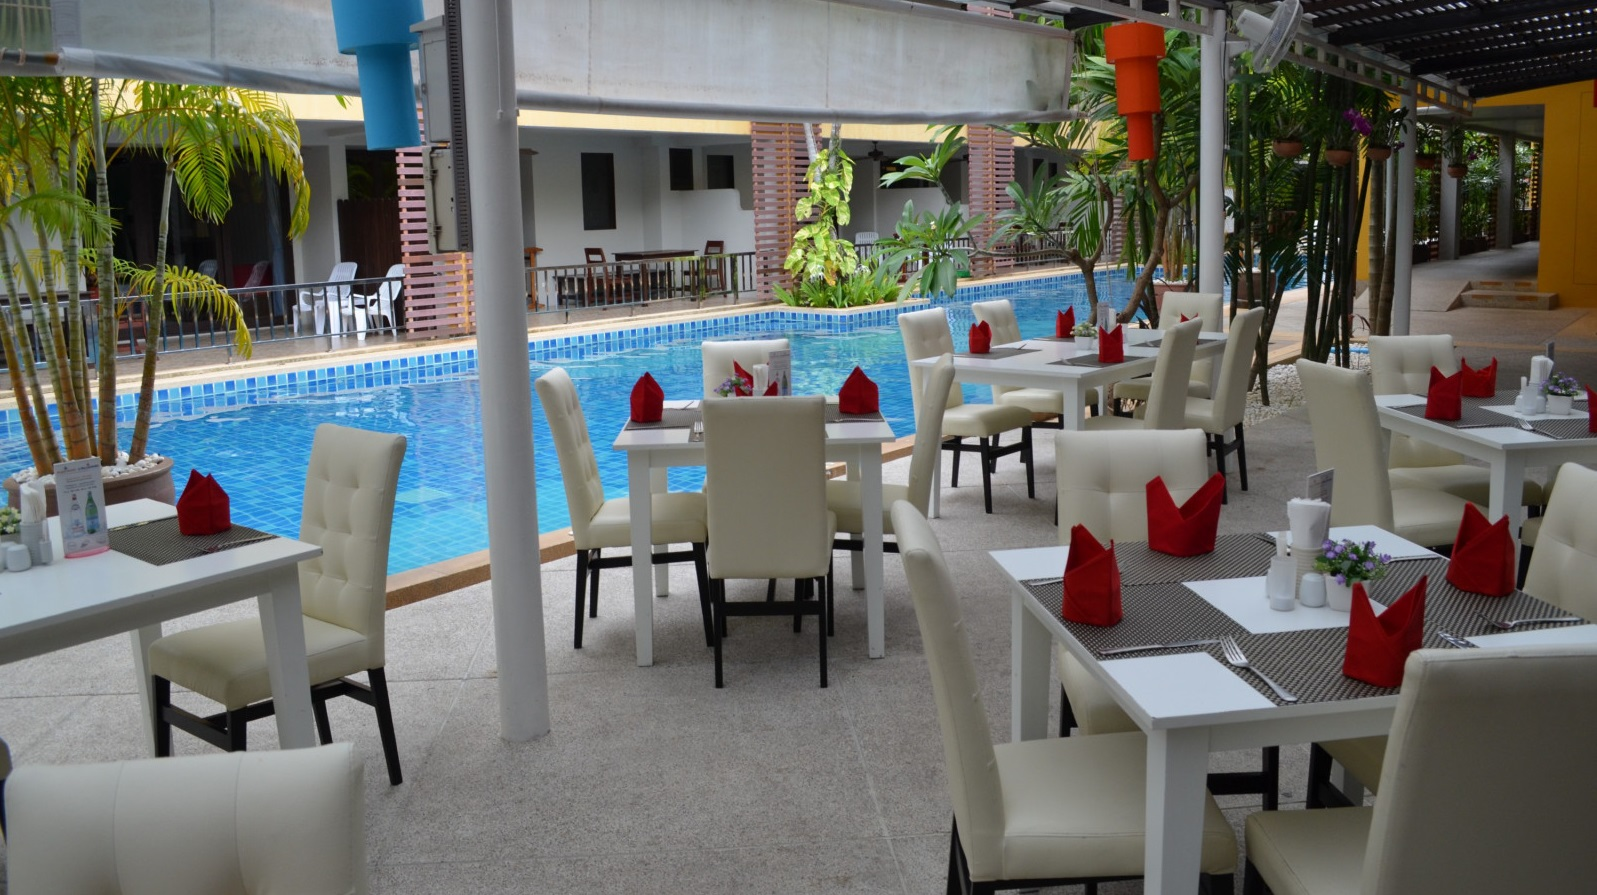 Фото ресторана в PGS Hotels Casa del Sol